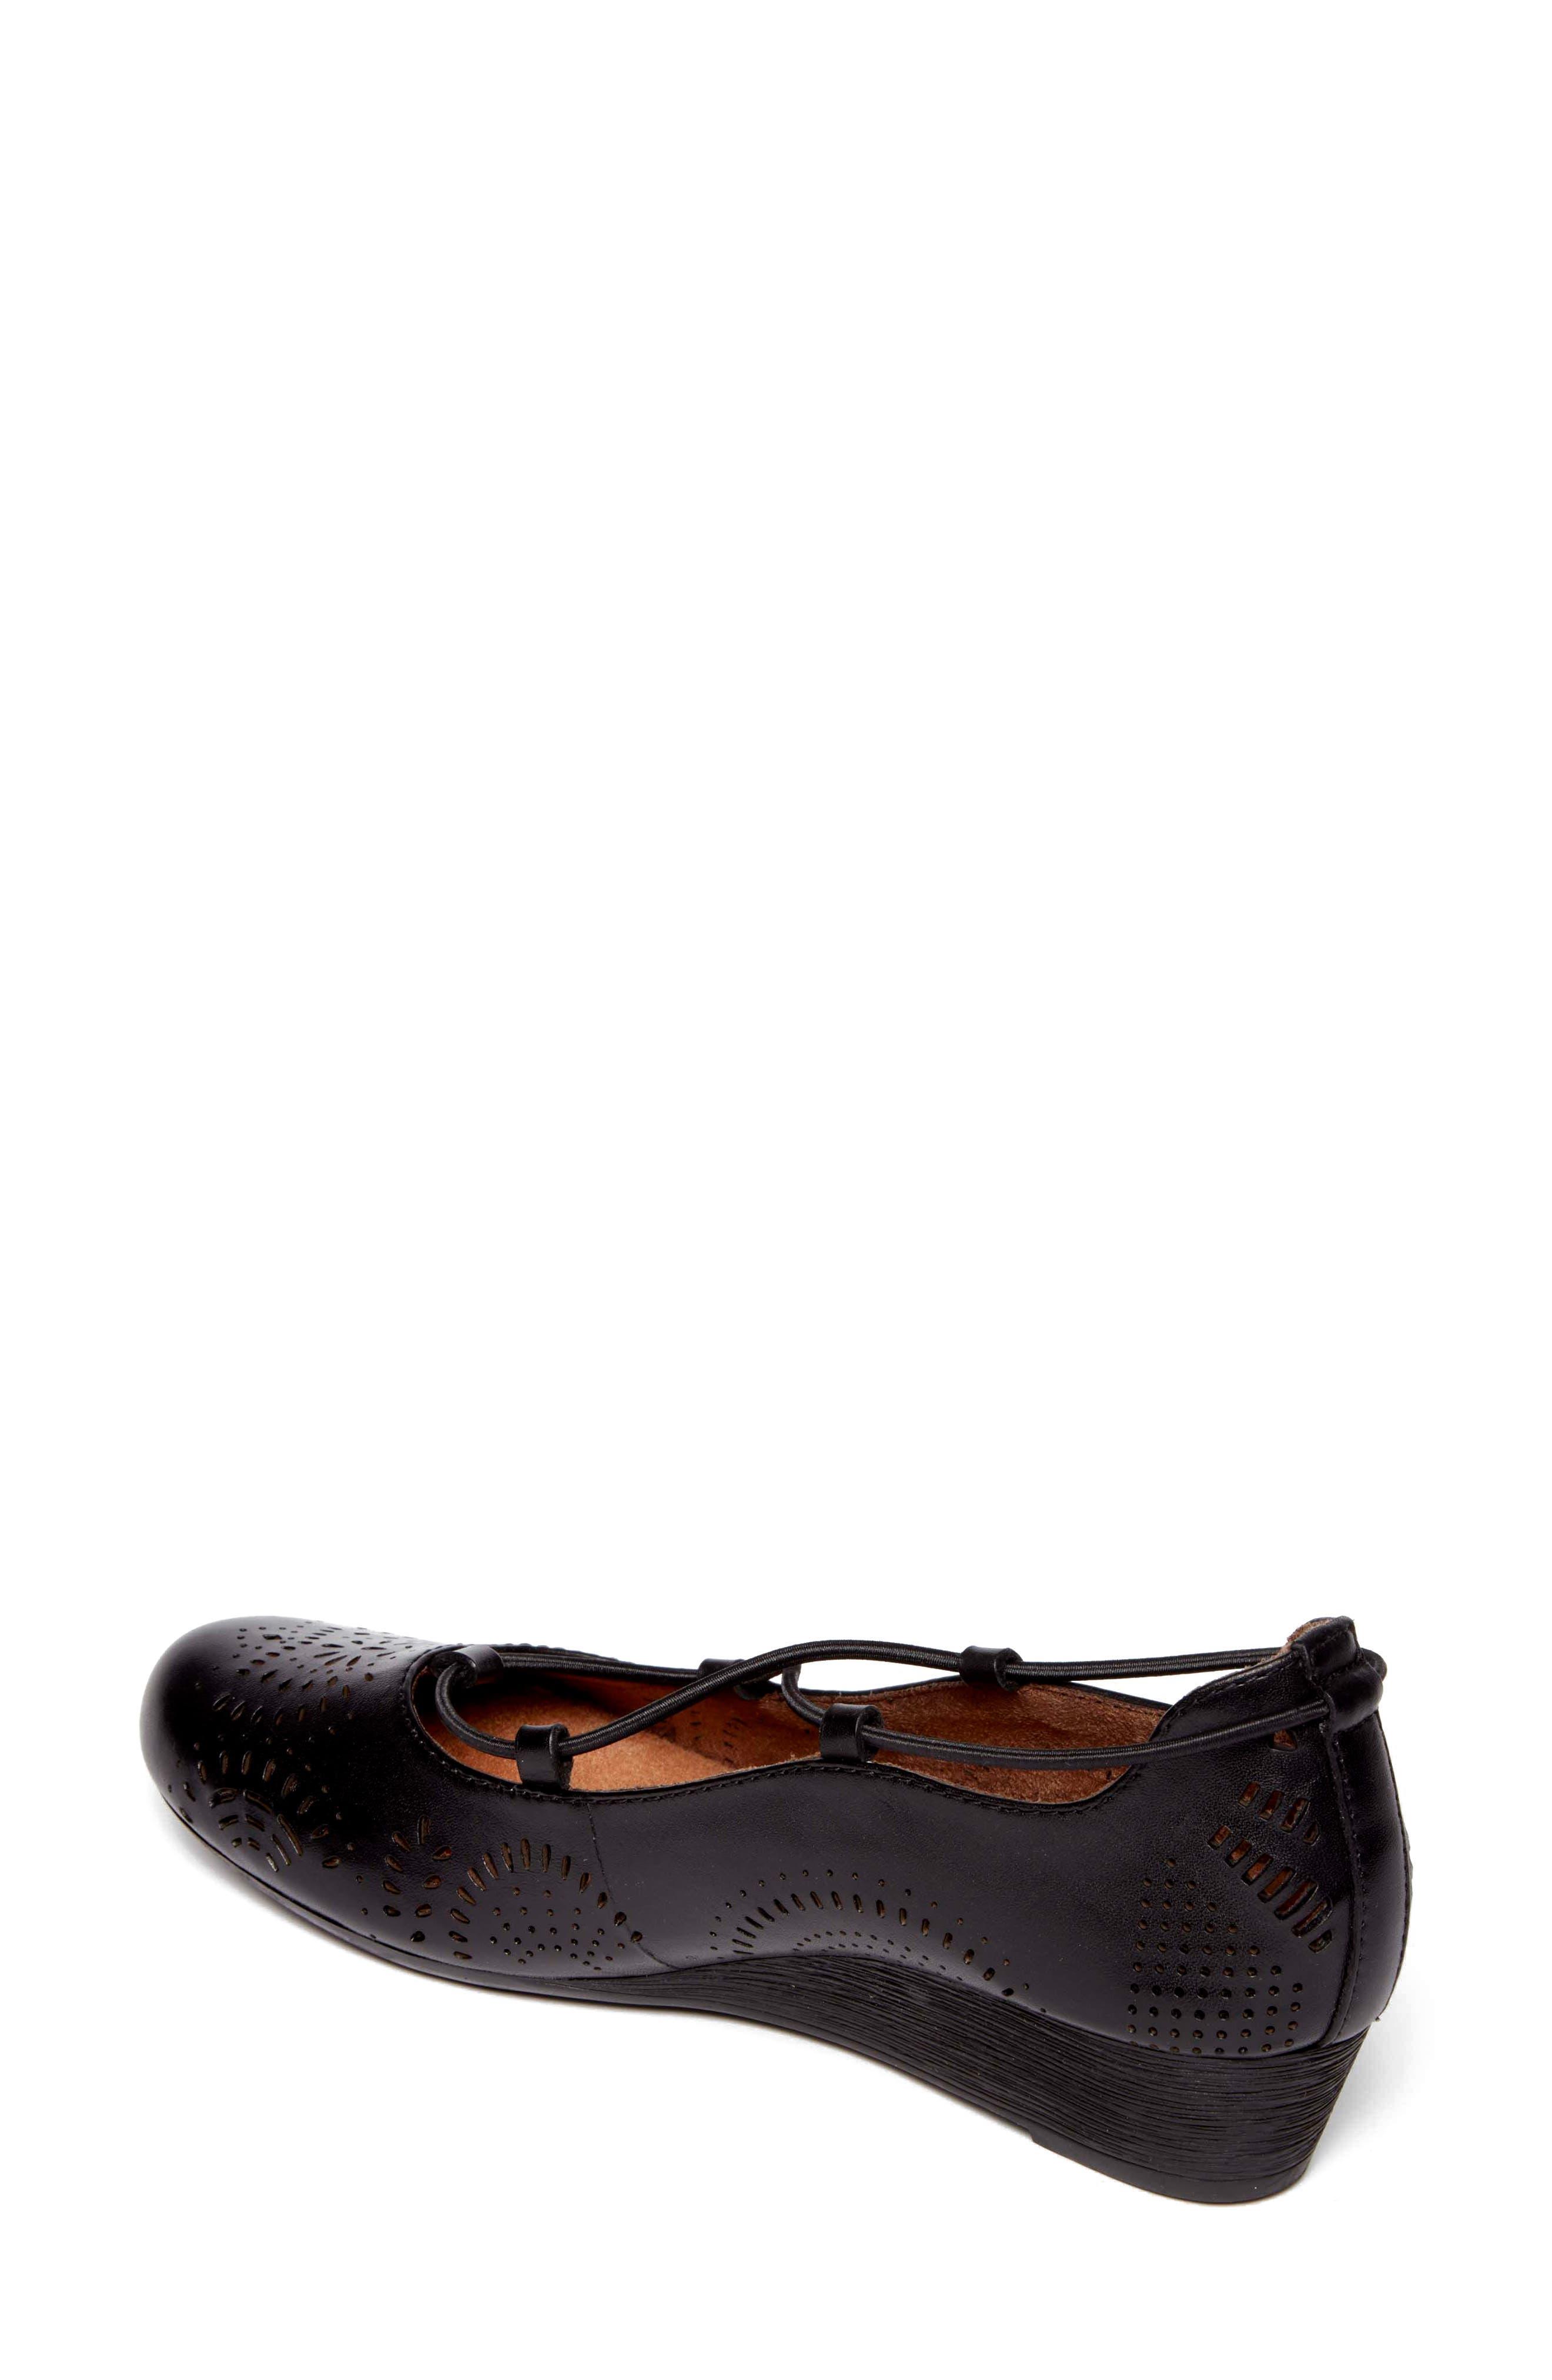 Janna Cross Strap Wedge Sandal,                             Alternate thumbnail 7, color,